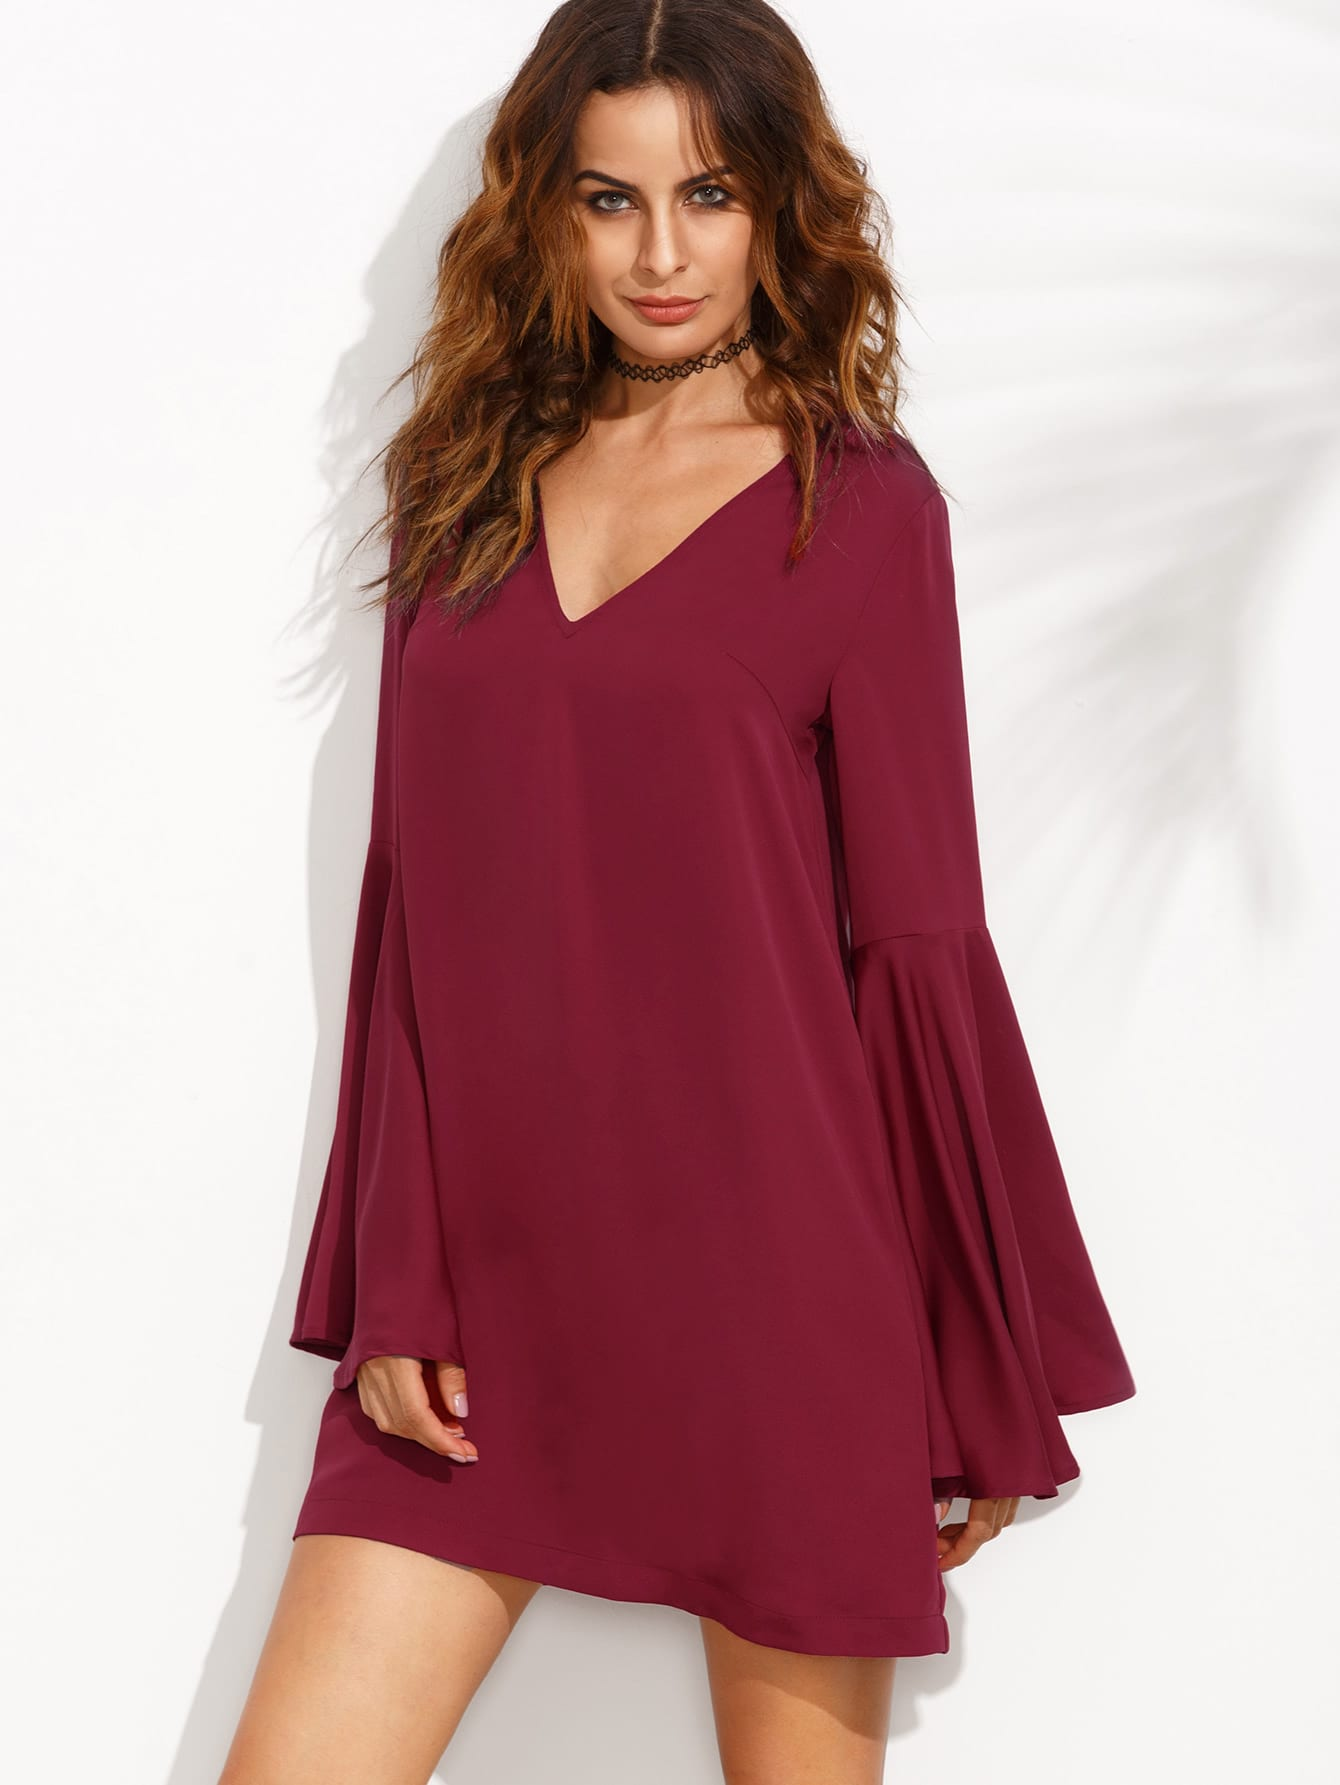 Burgundy V Neck Ruffle Long Sleeve Shift Dress